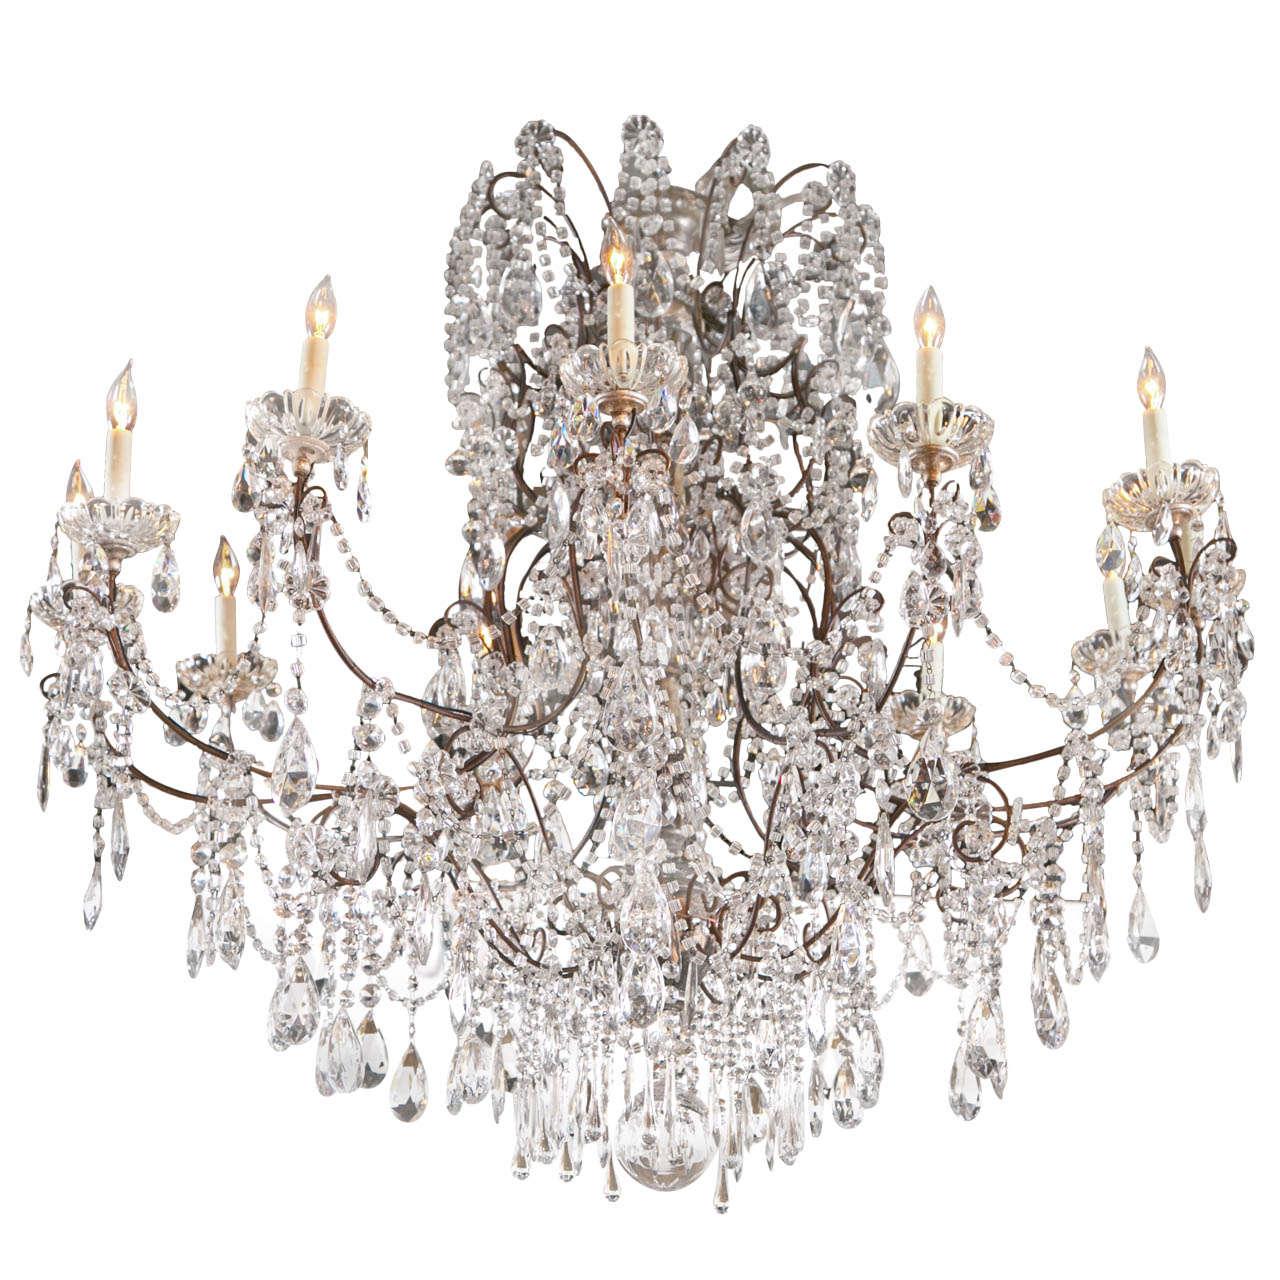 Grand ballroom crystal chandelier for sale at 1stdibs grand ballroom crystal chandelier for sale aloadofball Images